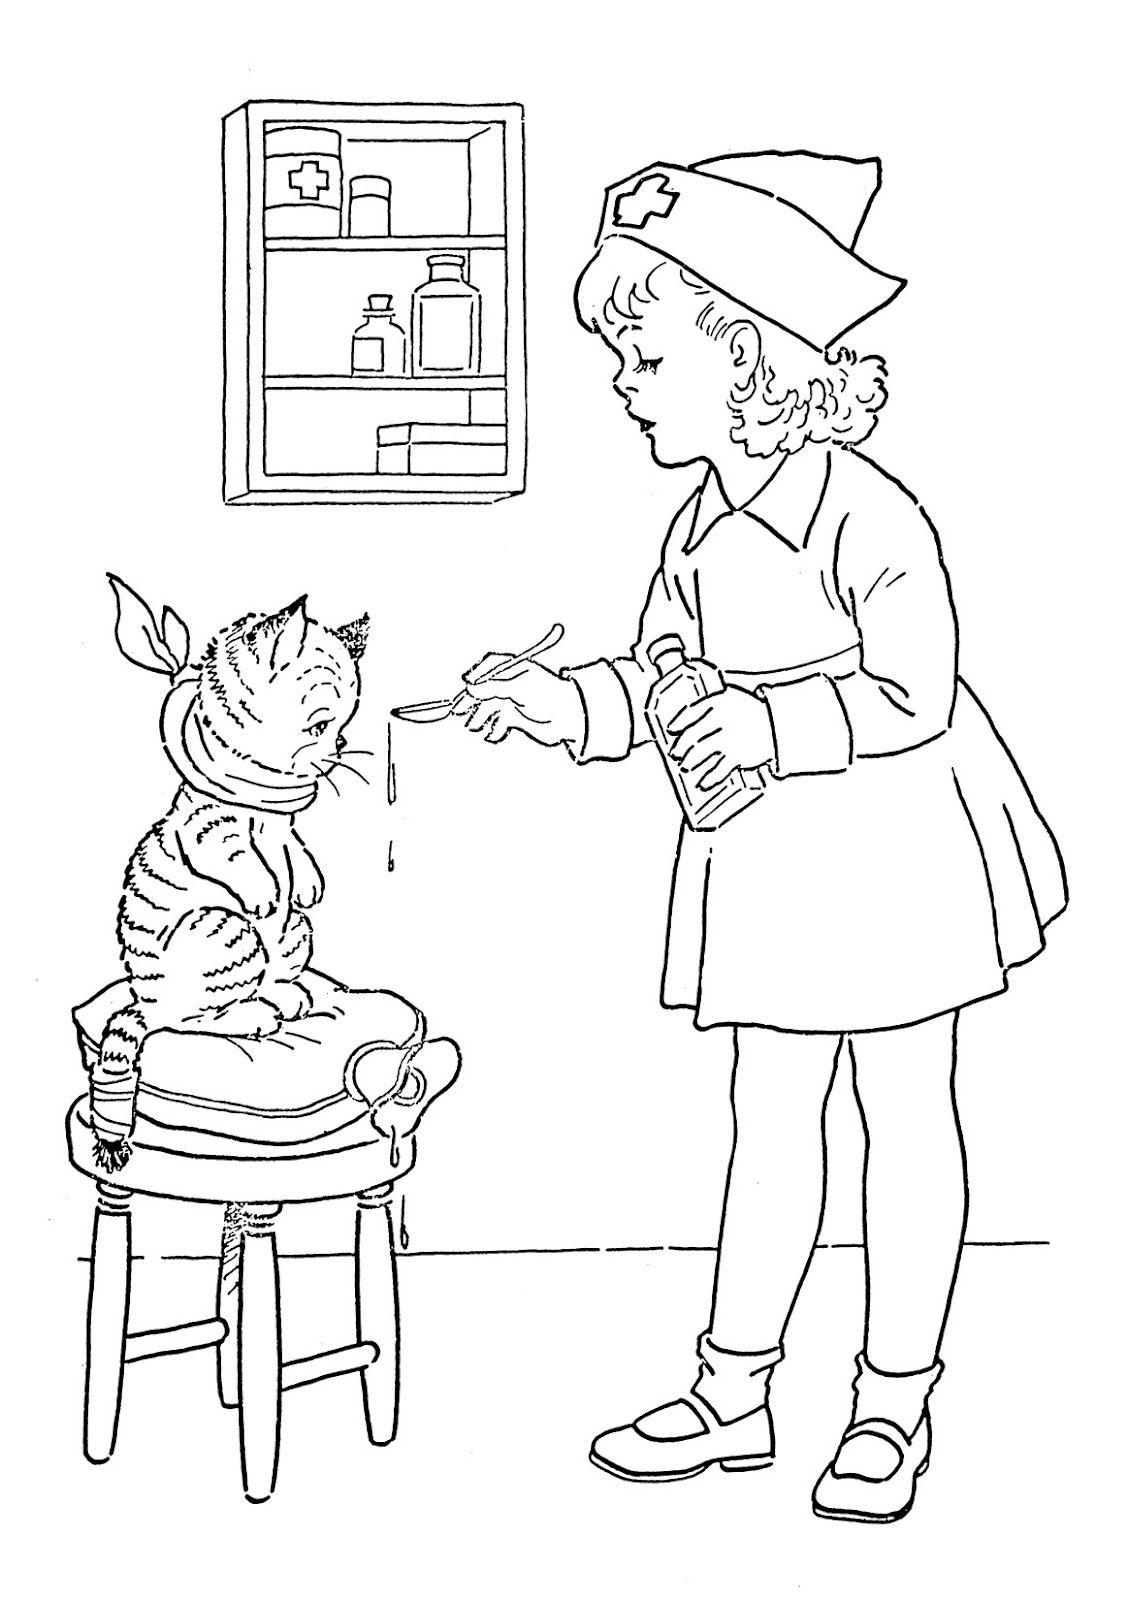 Kids Vintage Printable - Coloring Page - Lil Nurse | Coloring Pages ...